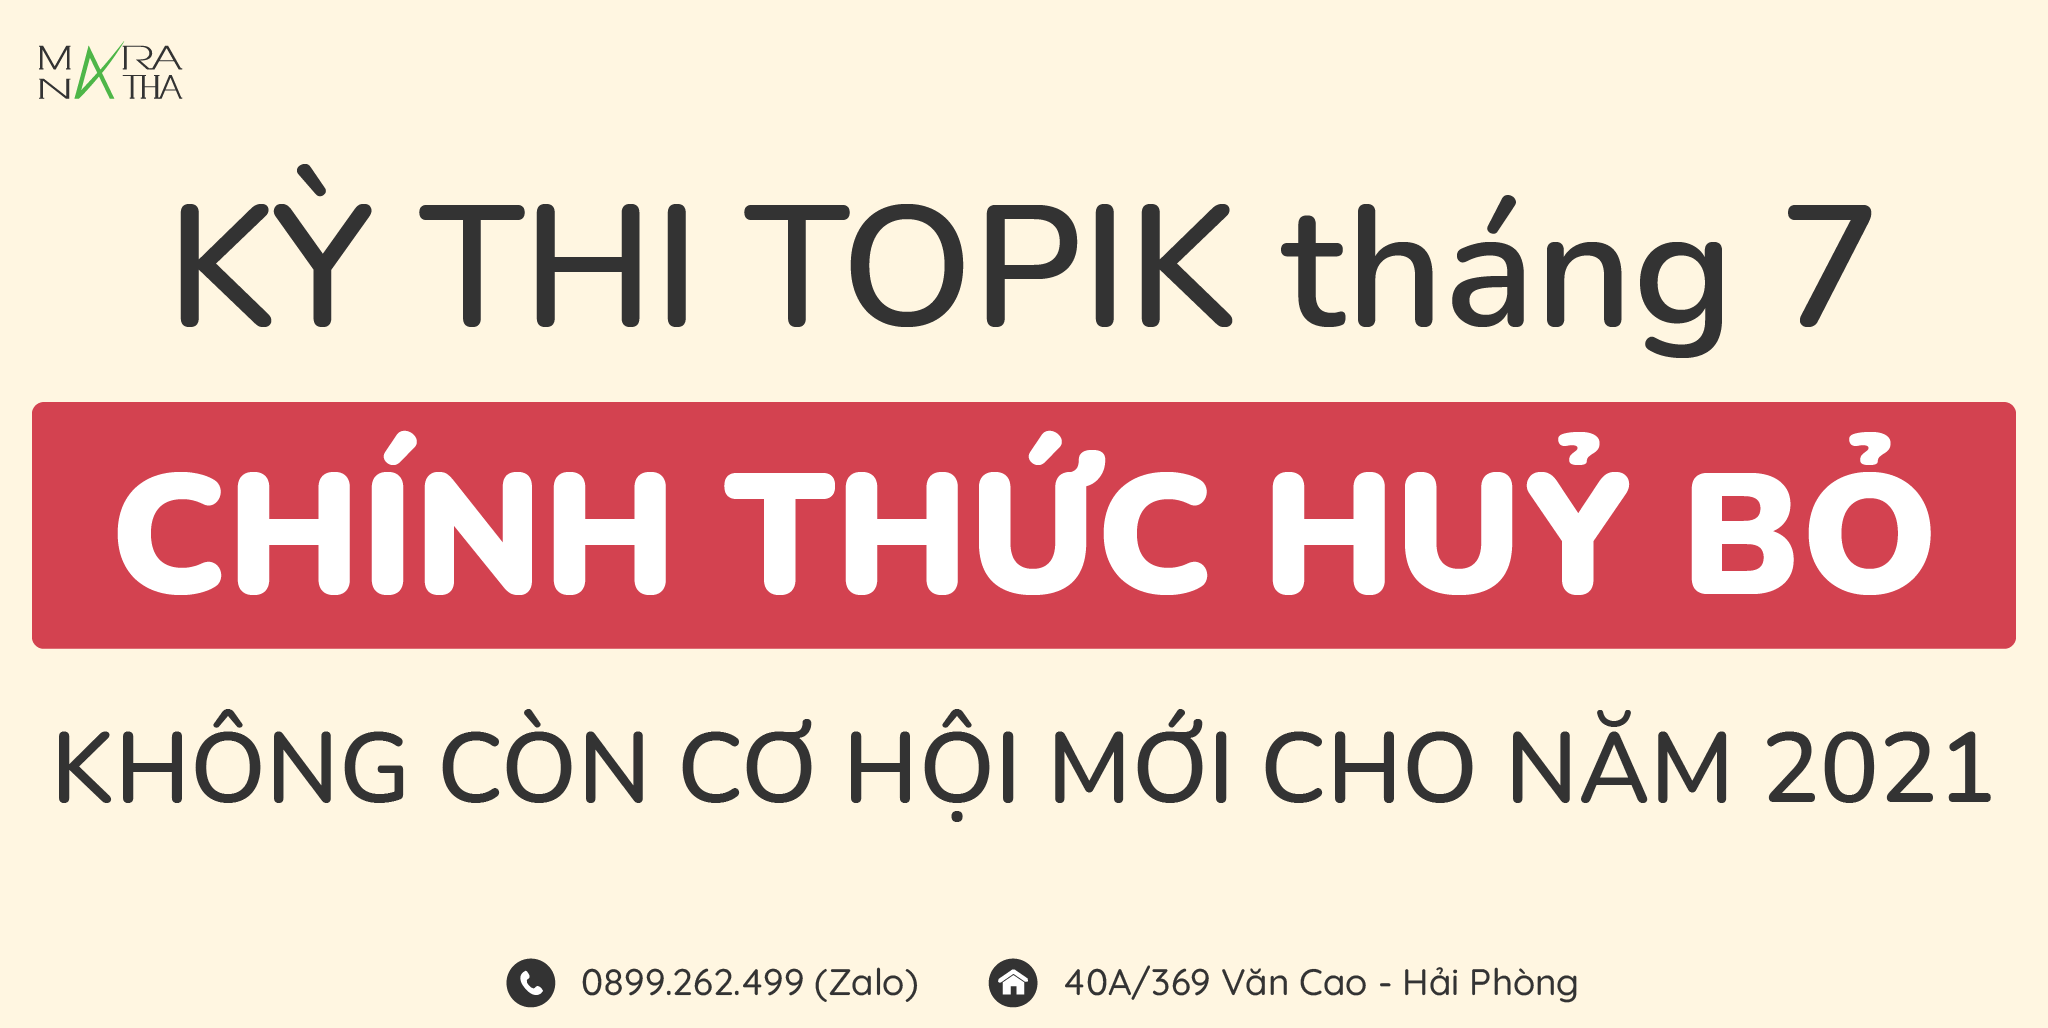 ky-thi-topik-77-chinh-thuc-huy-bo